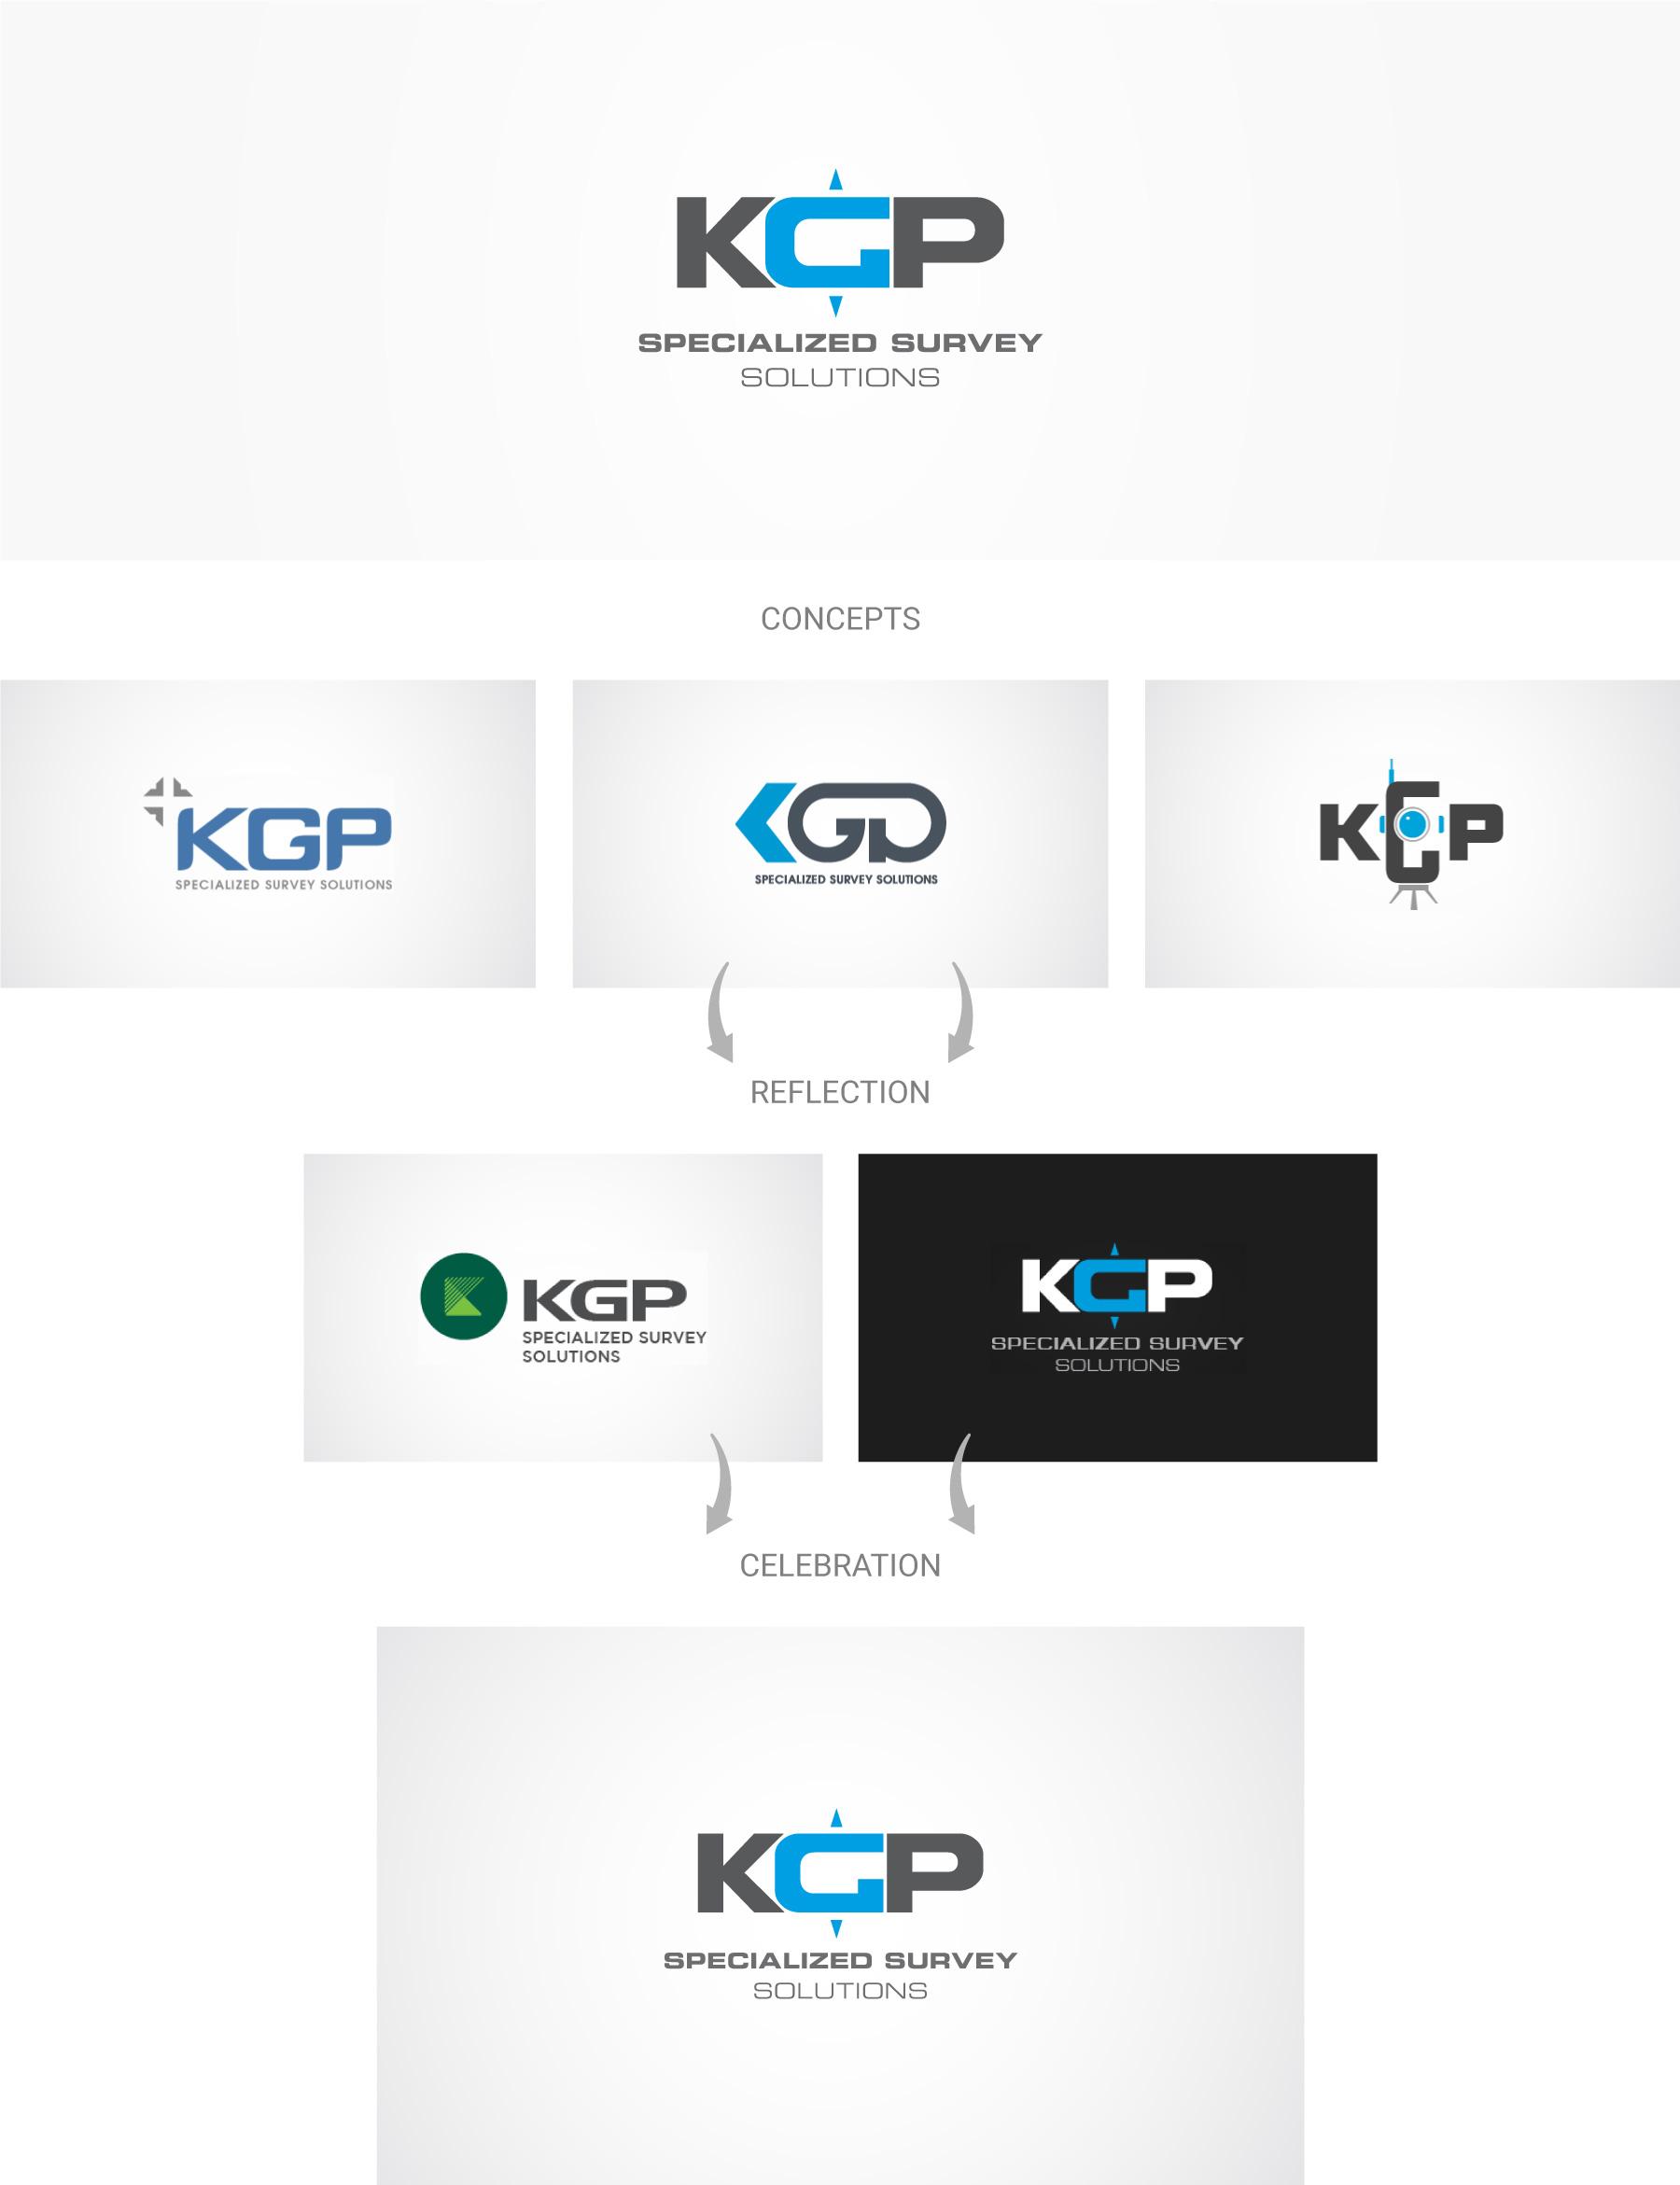 KGP-specialized-survey-solutions-logo-design